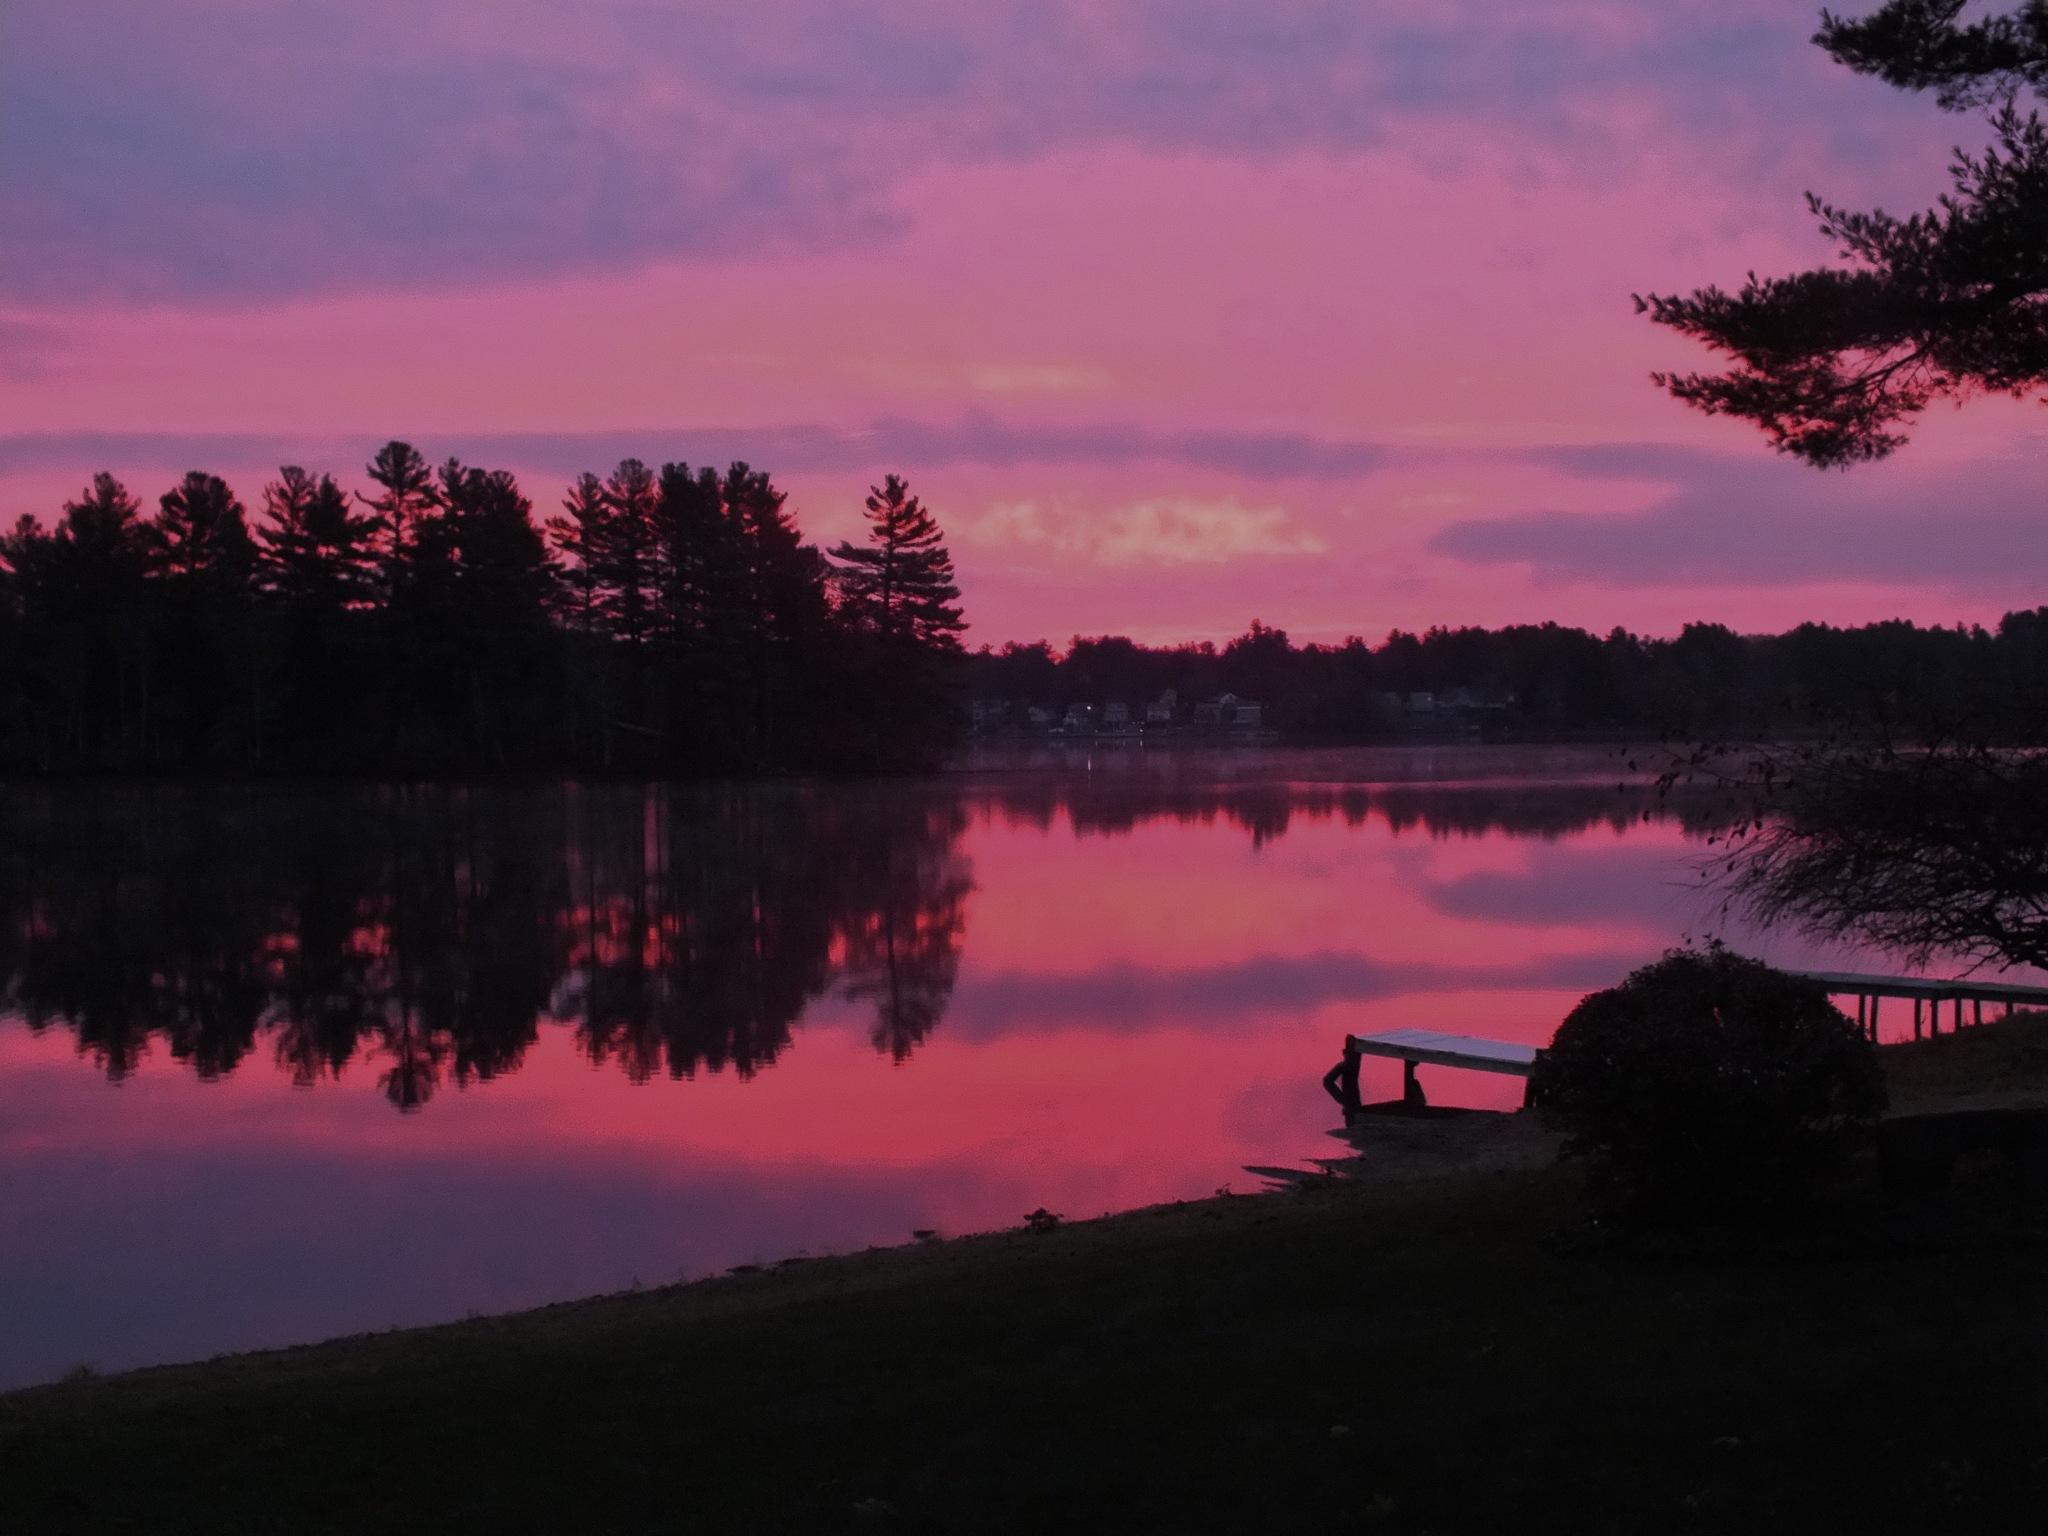 Sunrise Lake Lashaway, North Brookfield, Massachusetts by John B. Nurek